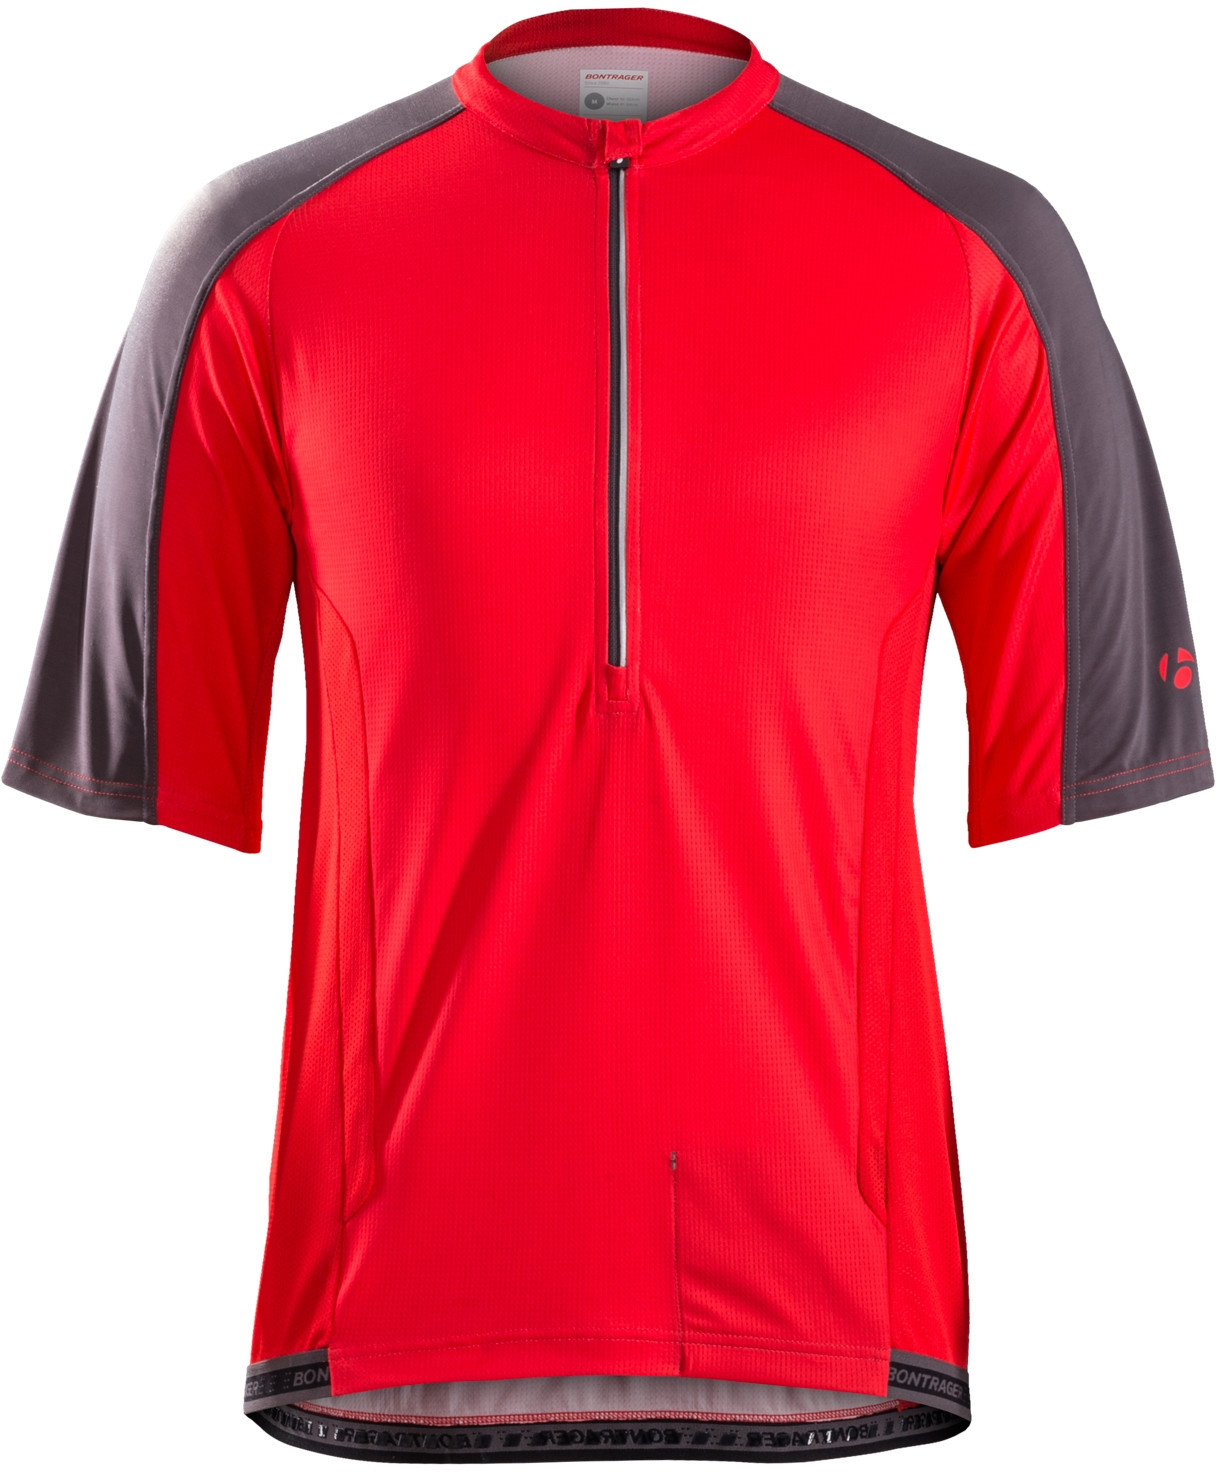 Bontrager Foray Cycling Jersey - Mens - Jerseys - Clothing